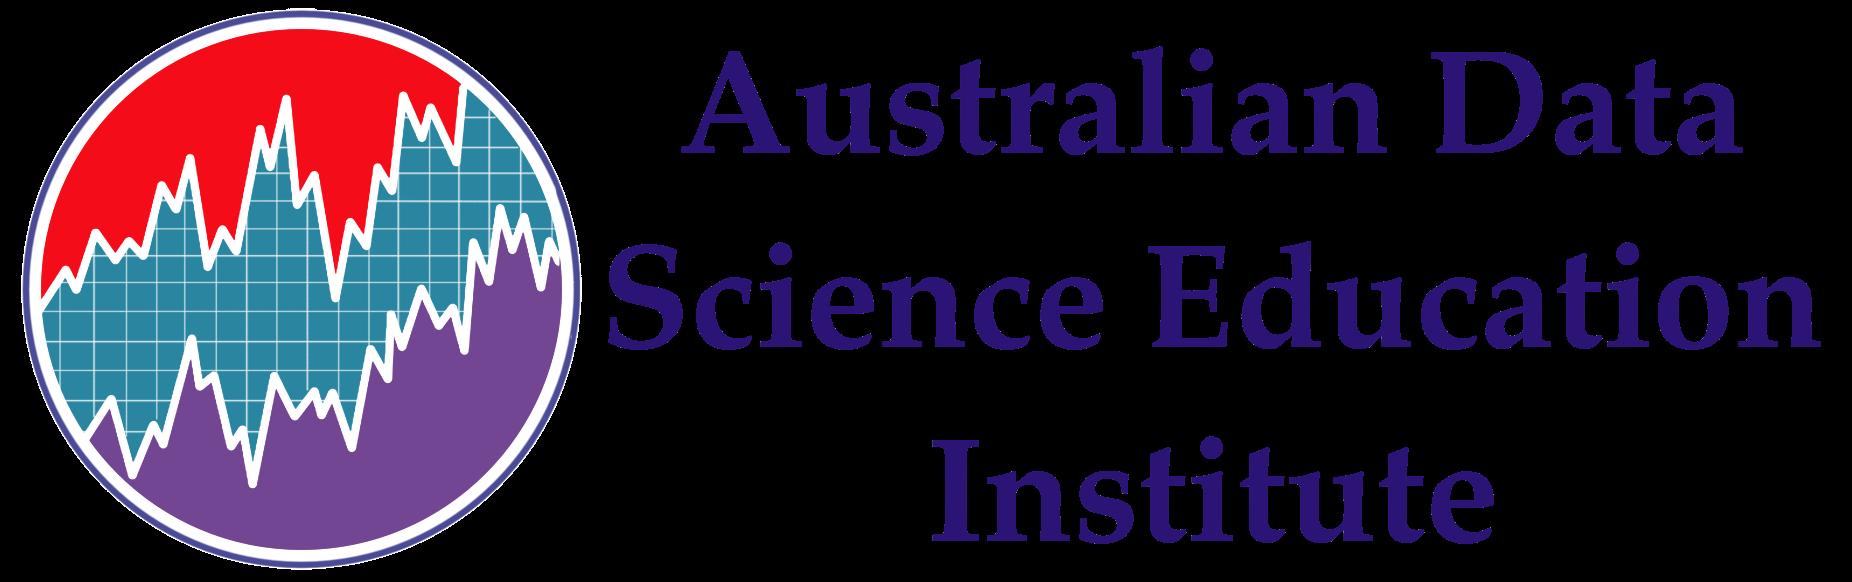 Australian Data Science Education Institute